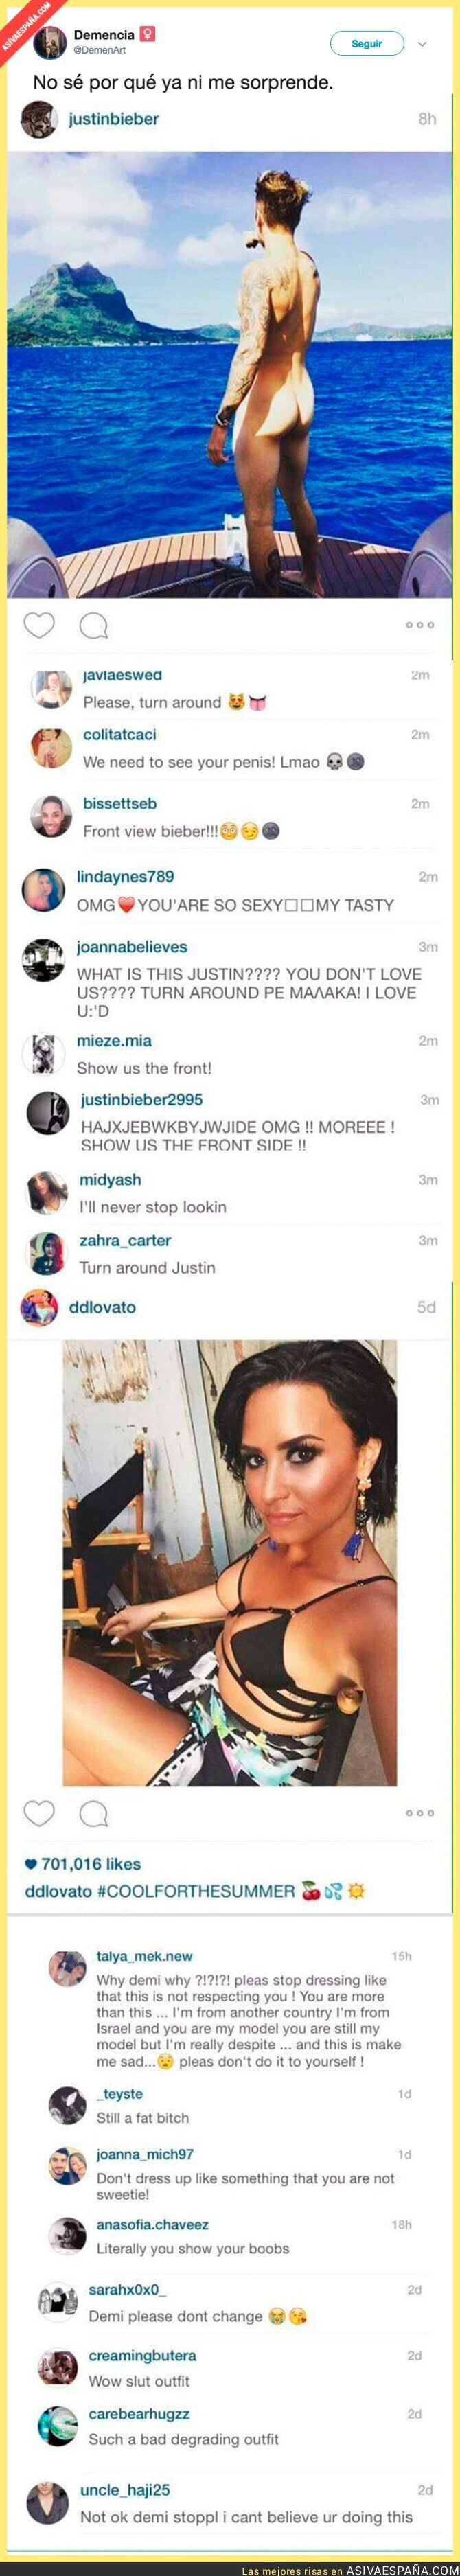 72734 - La diferencia de comentarios que recibe Justin Bieber totalmente desnudo y otra foto de Demi Lovato